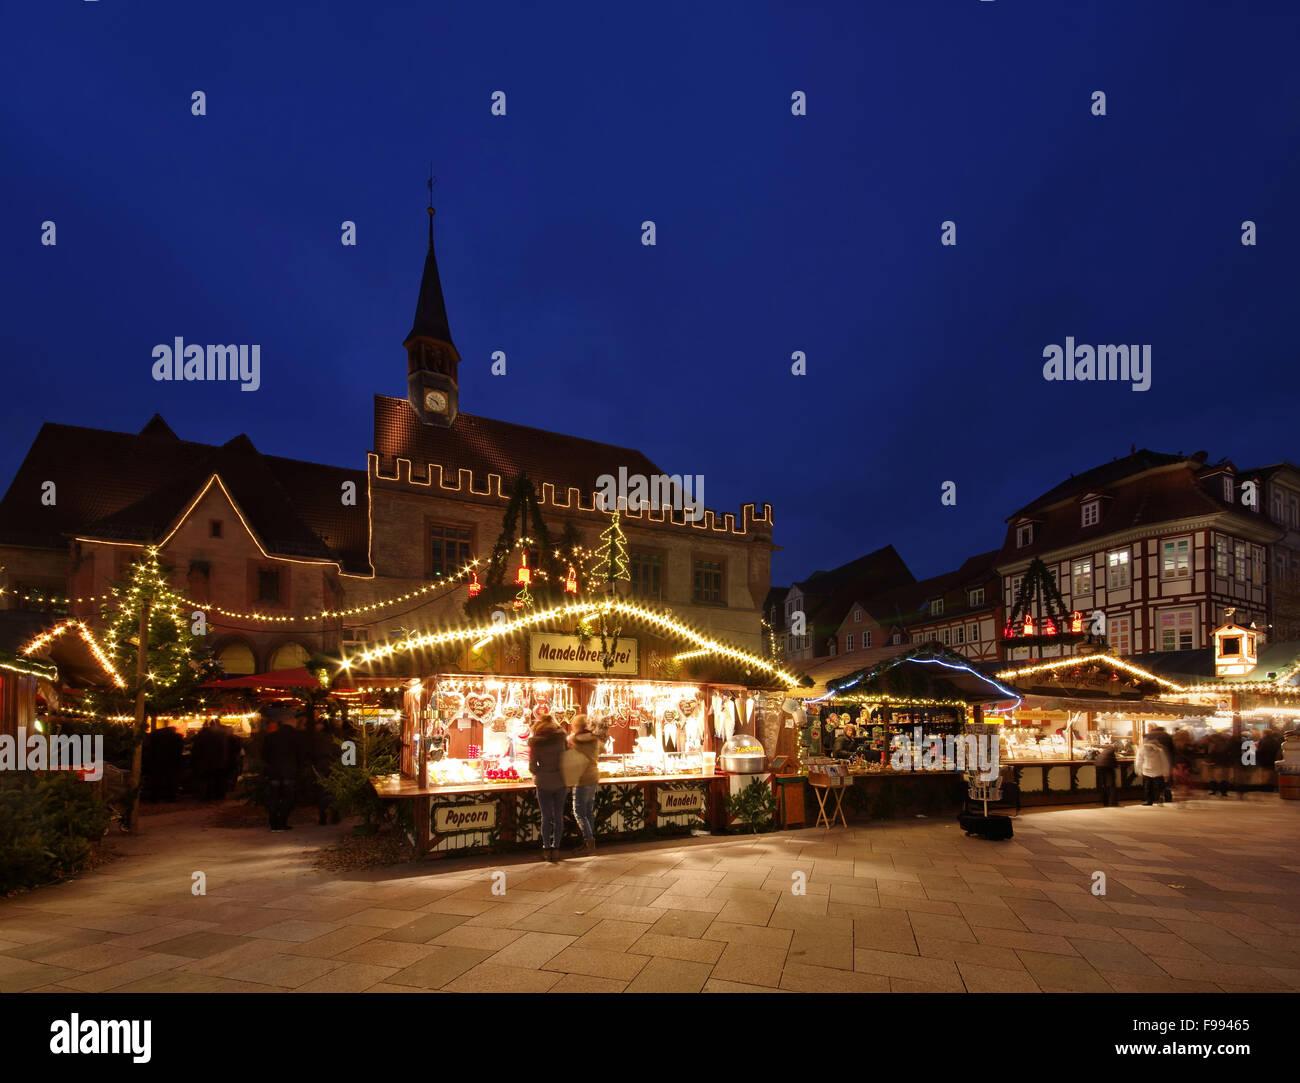 Weihnachtsmarkt Göttingen.Goettingen Weihnachtsmarkt Weihnachtsmarkt Göttingen 01 Stockfoto